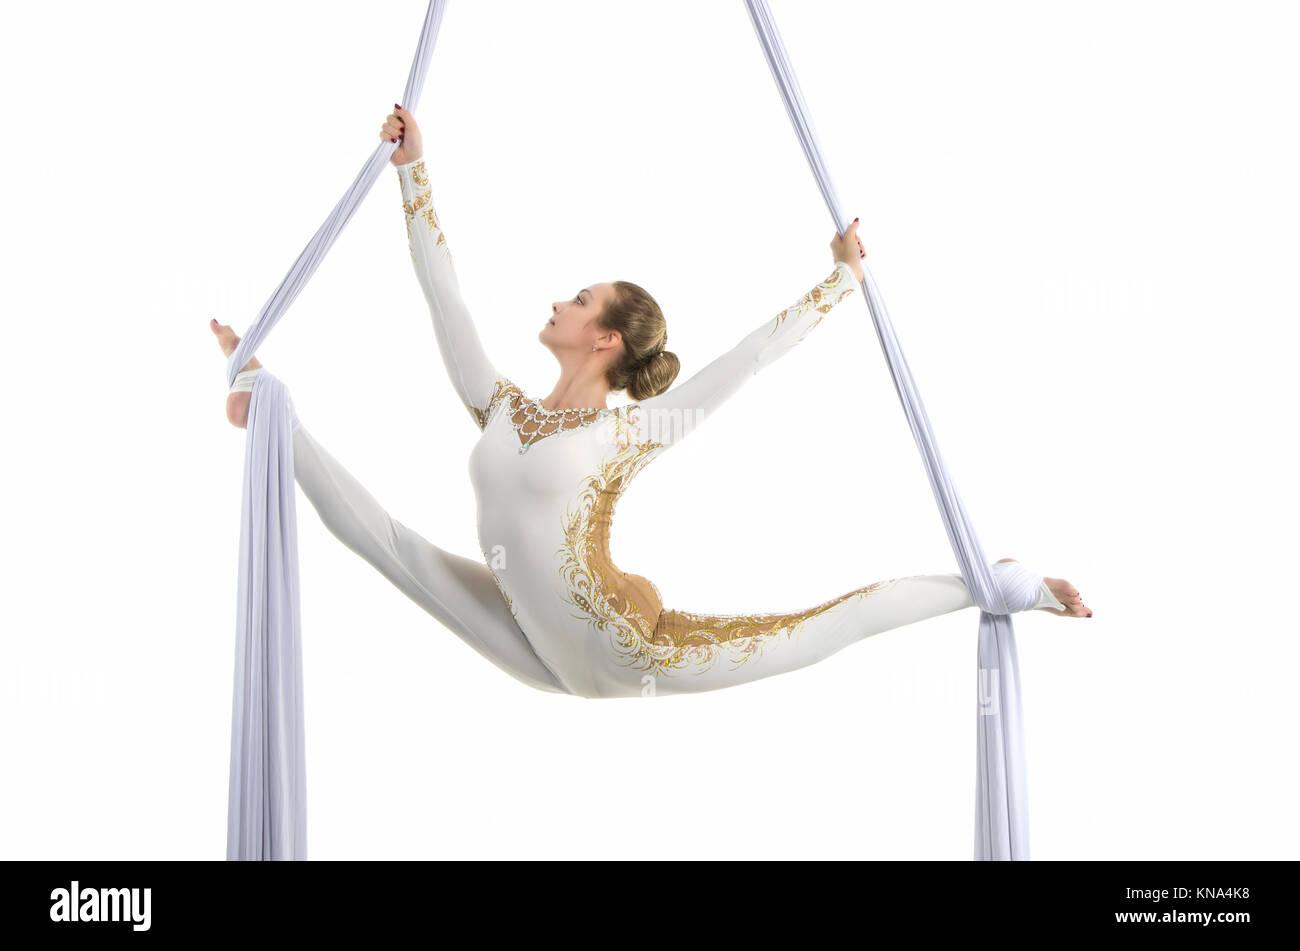 pretty woman   aerialist performing aerial tricks on aerial silks  studio shooting on a white aerial tricks stock photos  u0026 aerial tricks stock images   alamy  rh   alamy